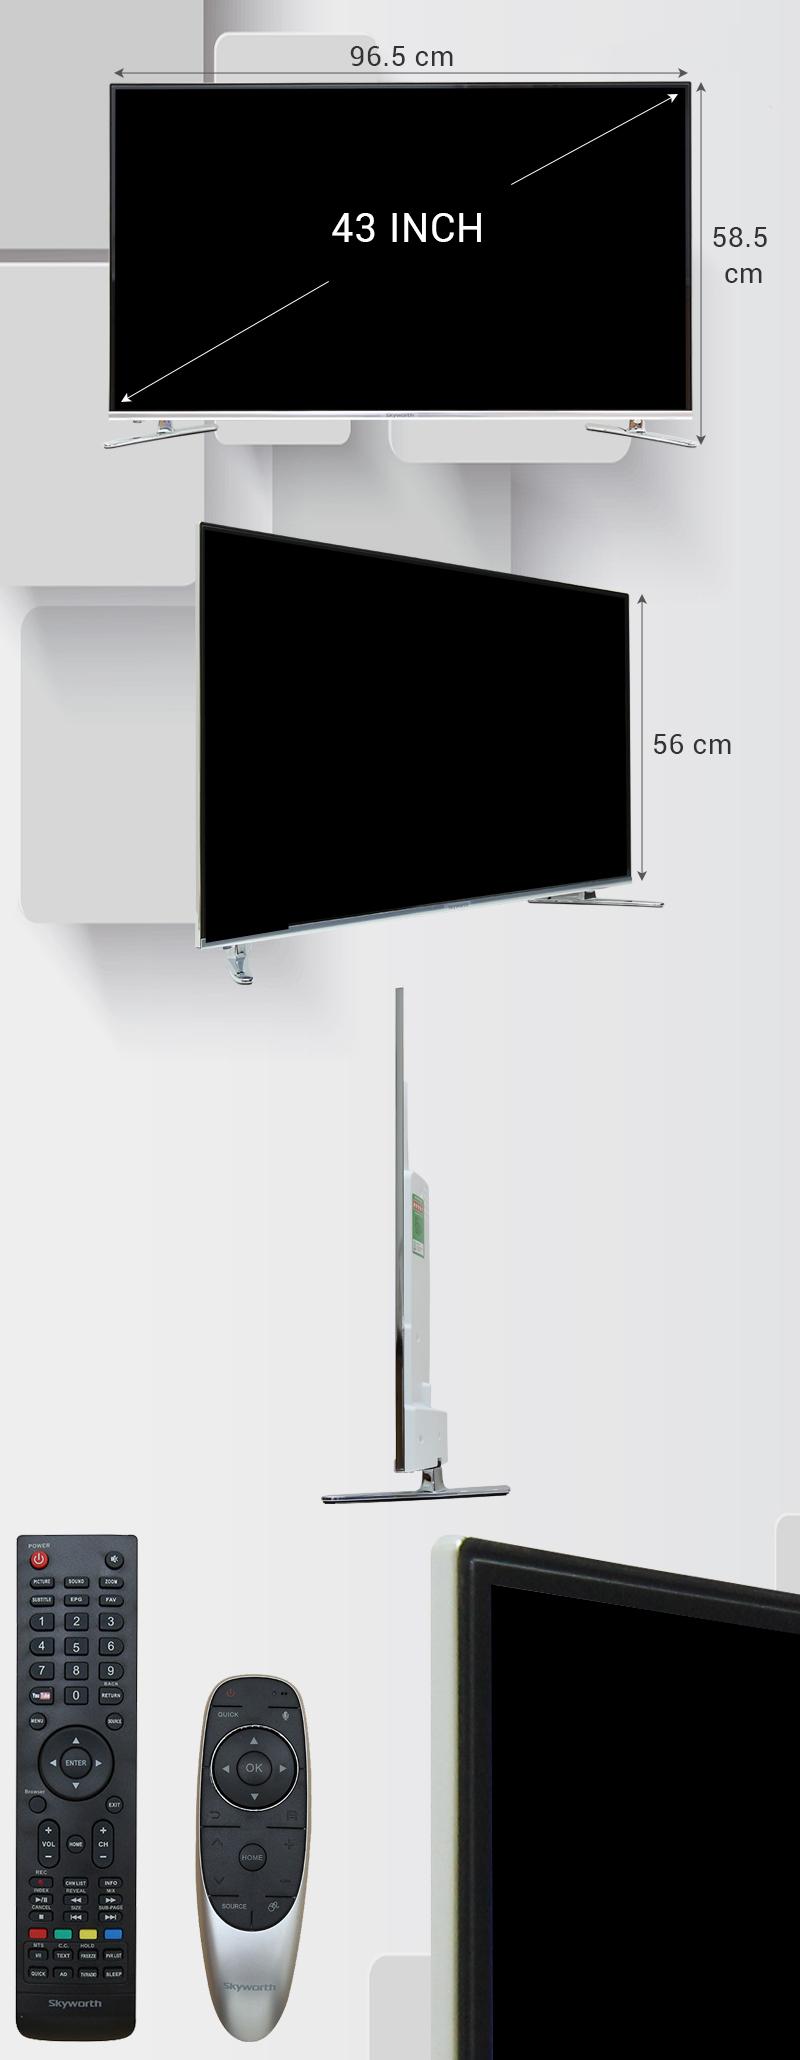 Smart Tivi Skyworth GLED 43 inch 43K920S - Kích thước TV